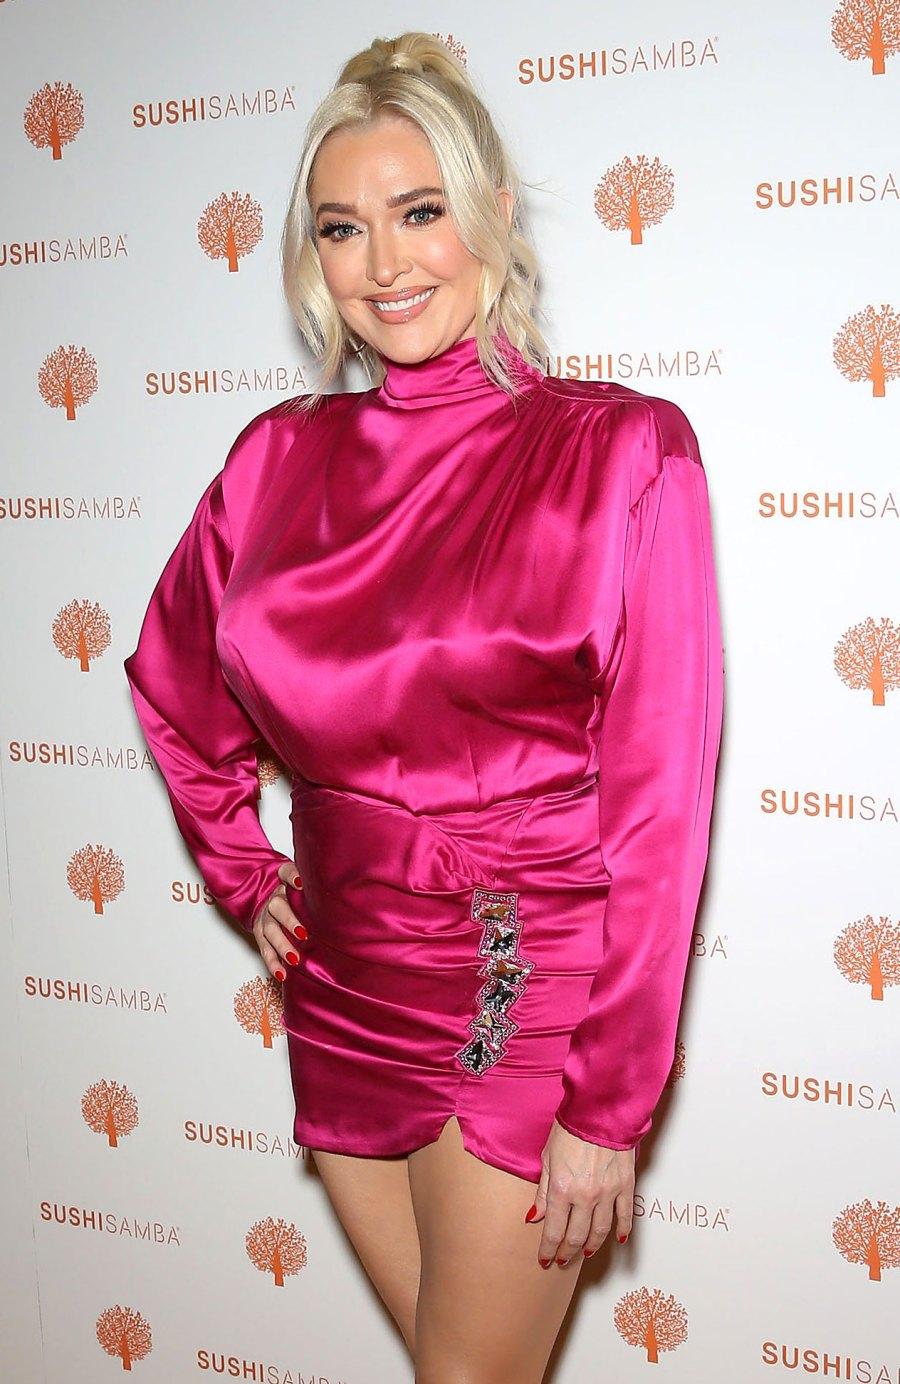 Erika Jayne Great Mood Rare Public Appearance Amid Legal Woes SUSHISAMBA